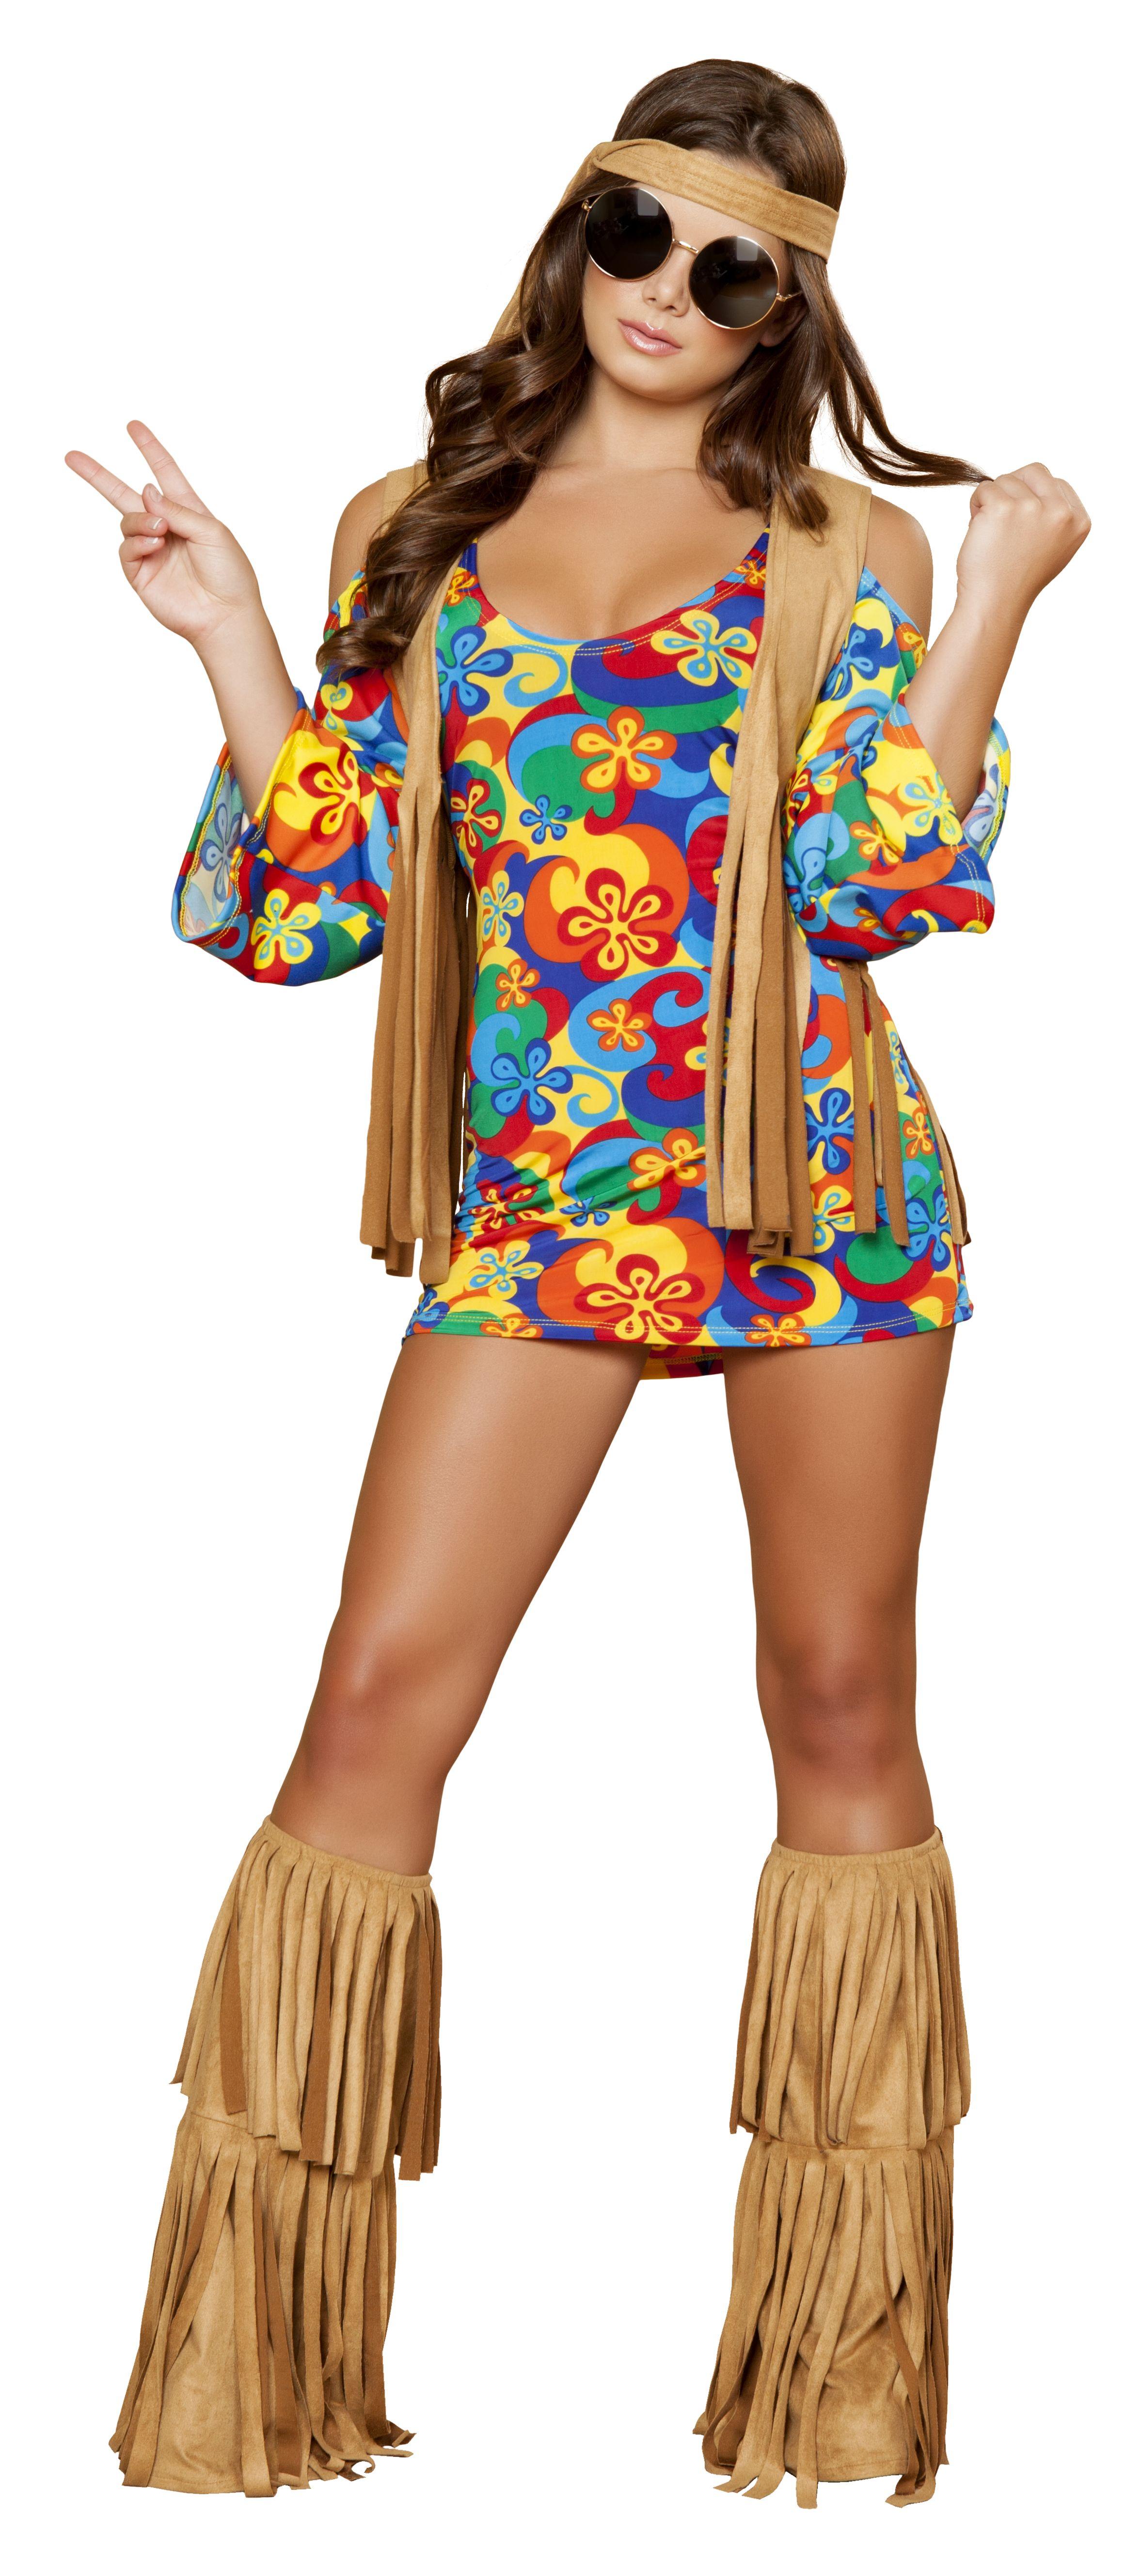 The dress halloween costume - Deluxe Adult Princess Leia Costume